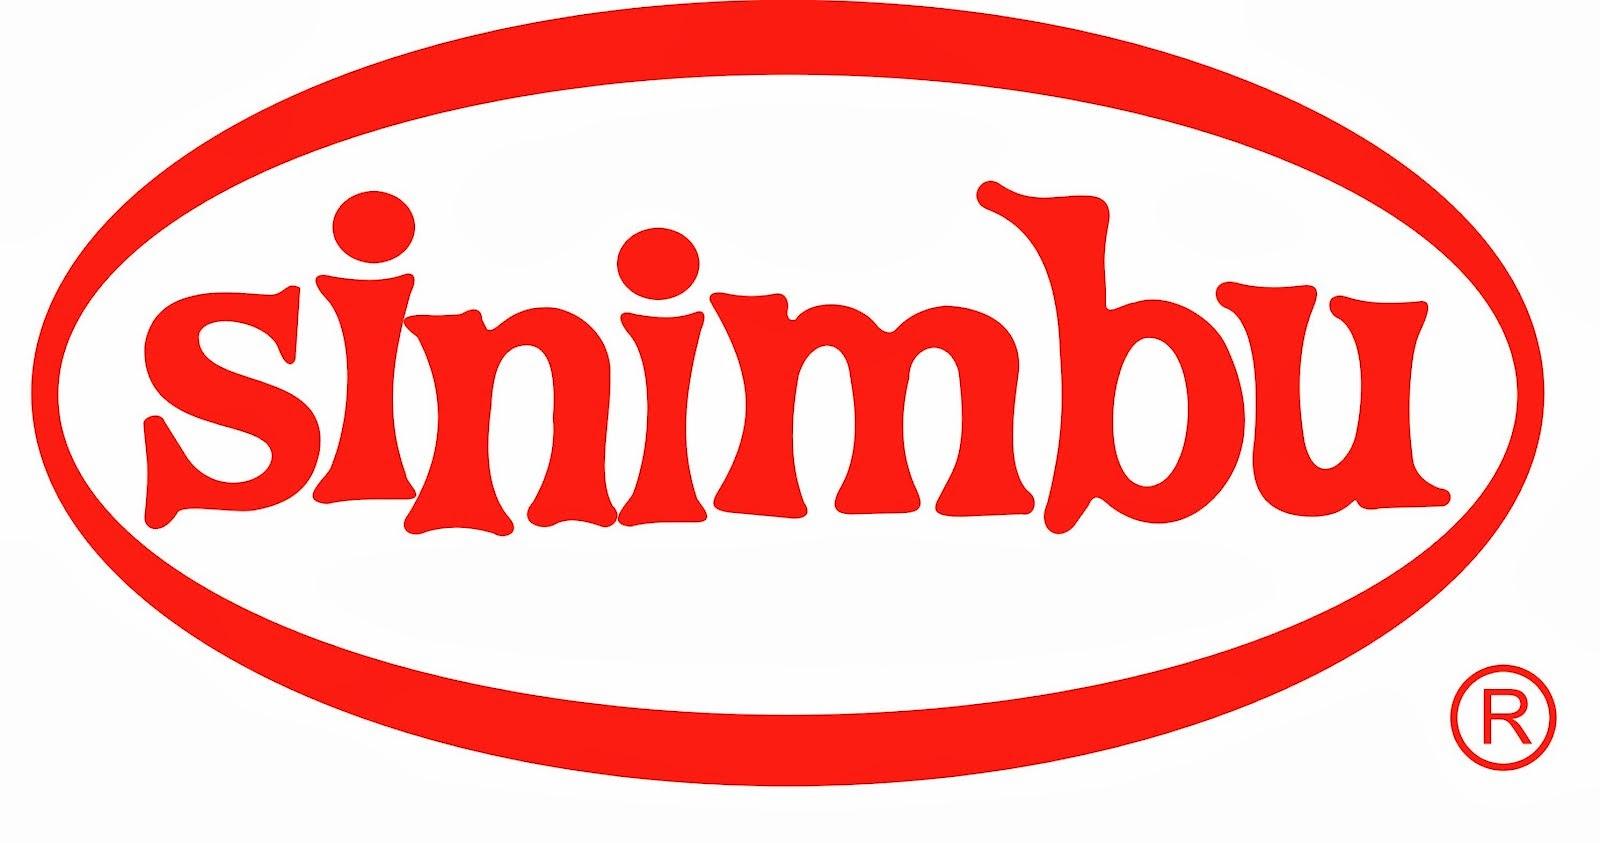 Parceria: Sinimbu